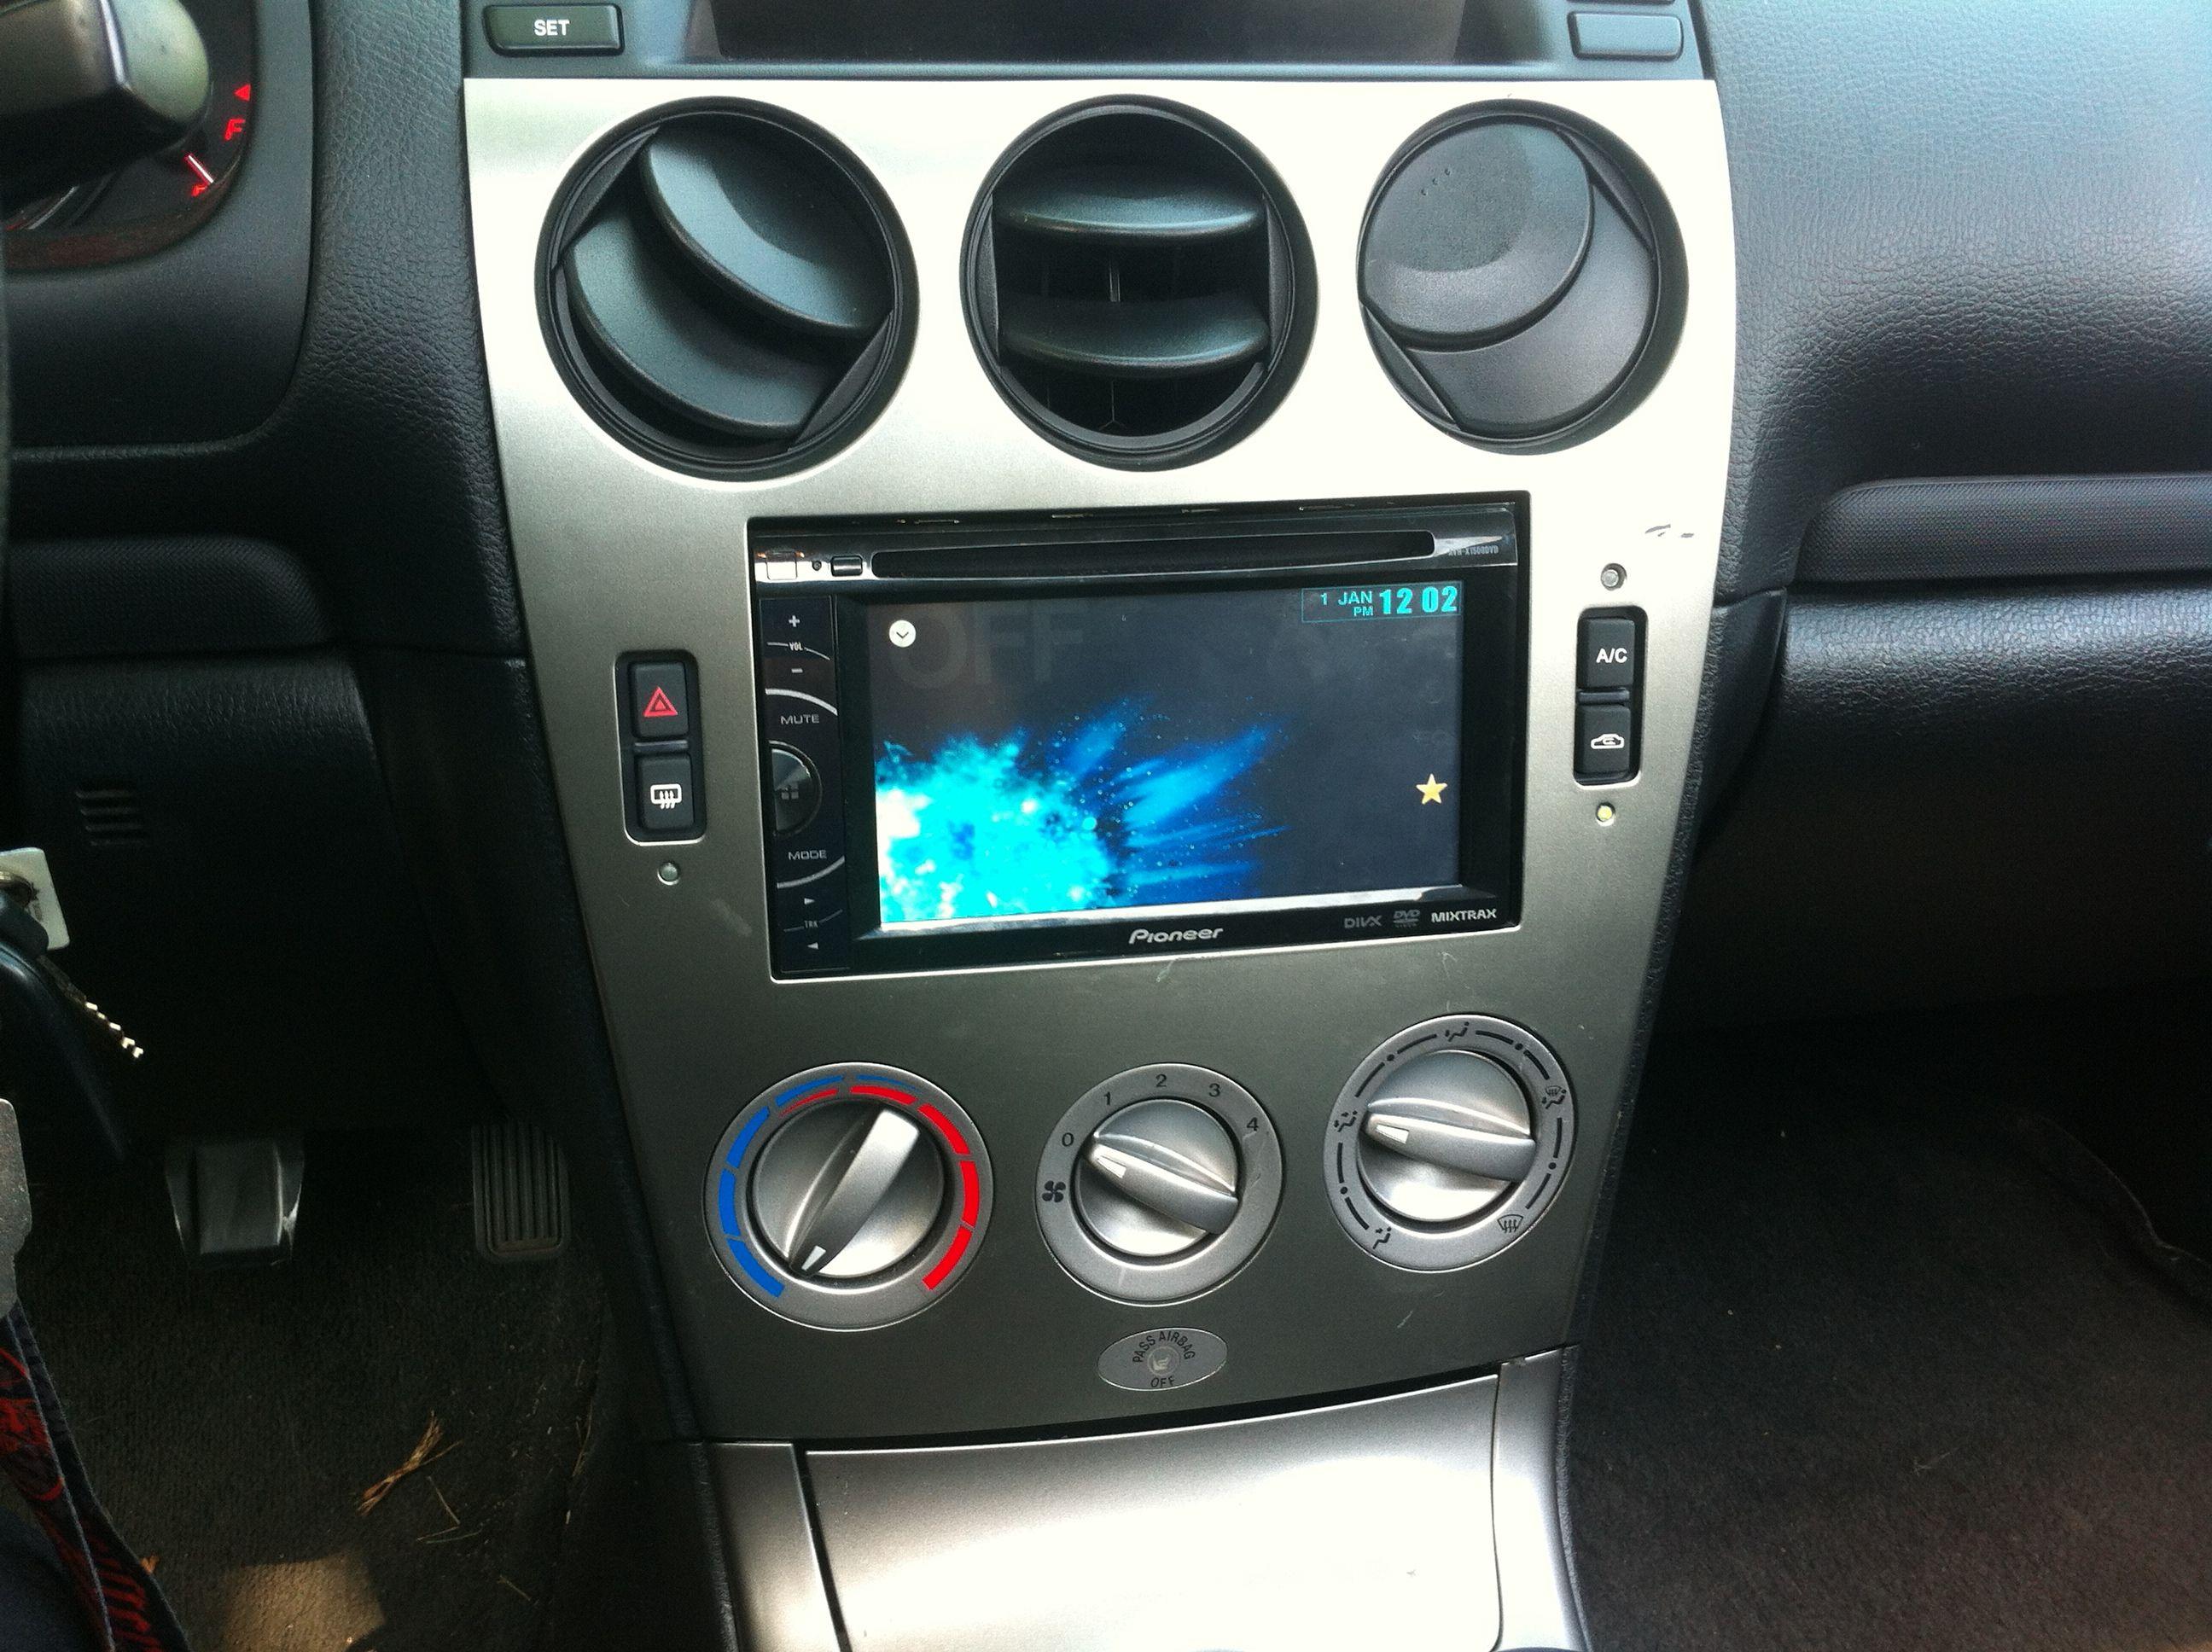 Mazda Aftermarket Stereo Free Download bull Playapk co